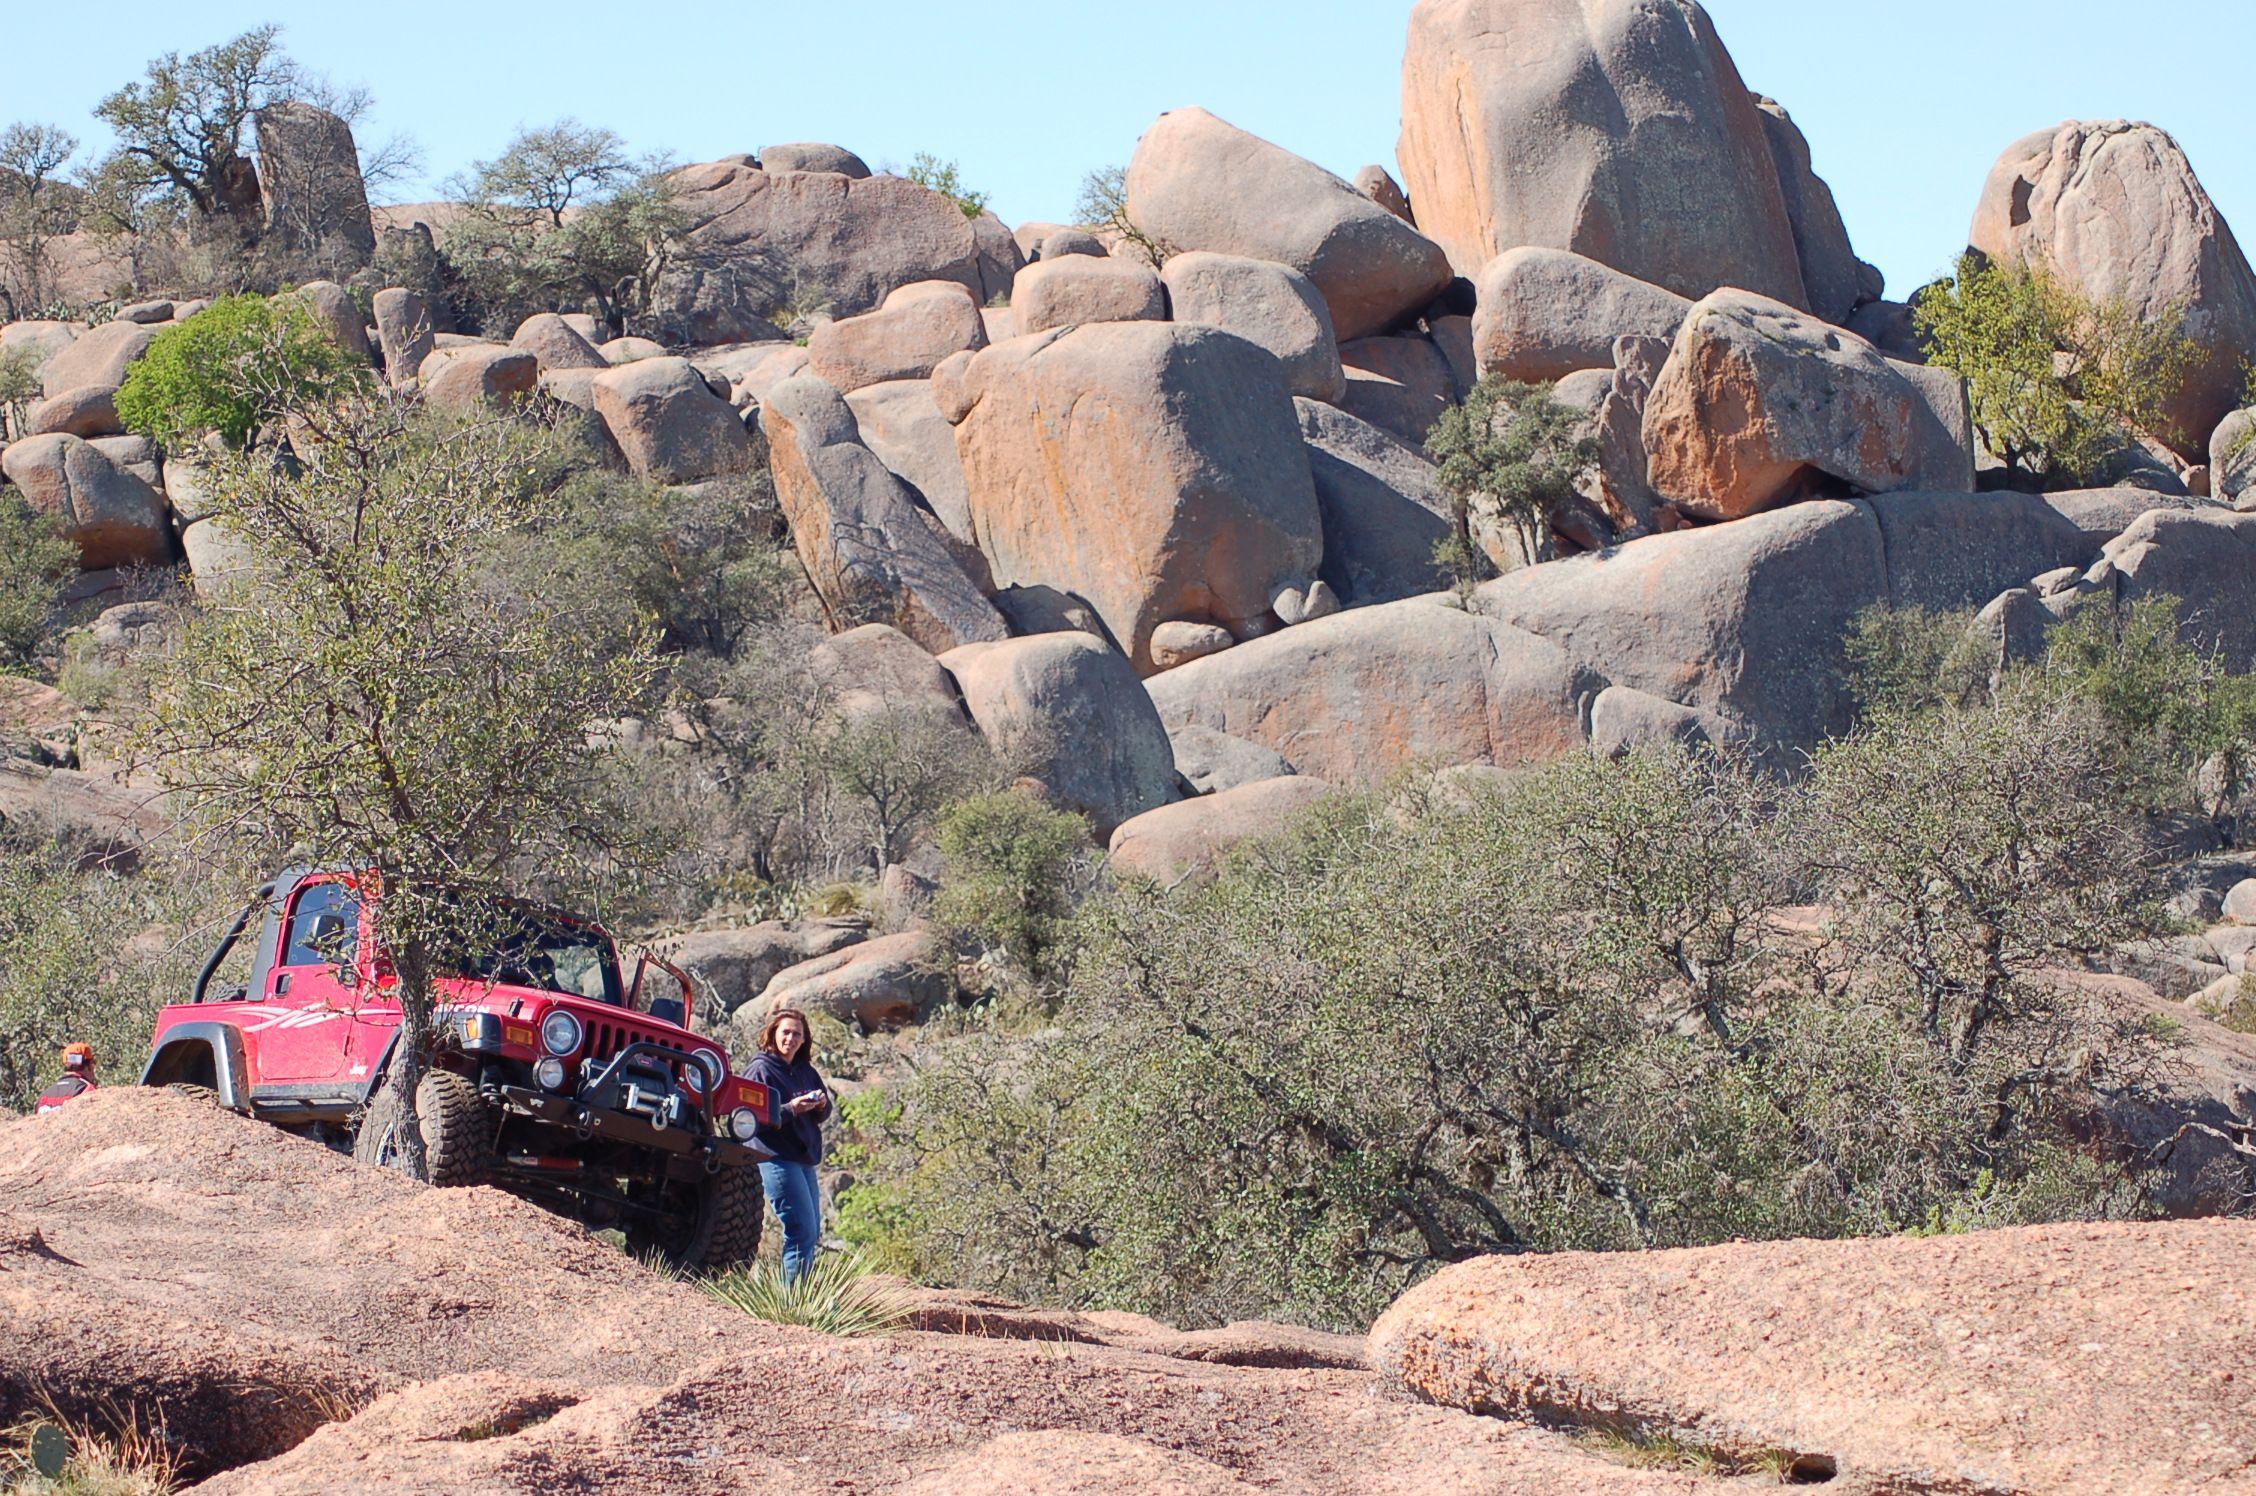 Near Llano Texas Inks Ranch At The Texas Spur Jeep Jamboree Jeep Jamboree Jeep Mount Rushmore